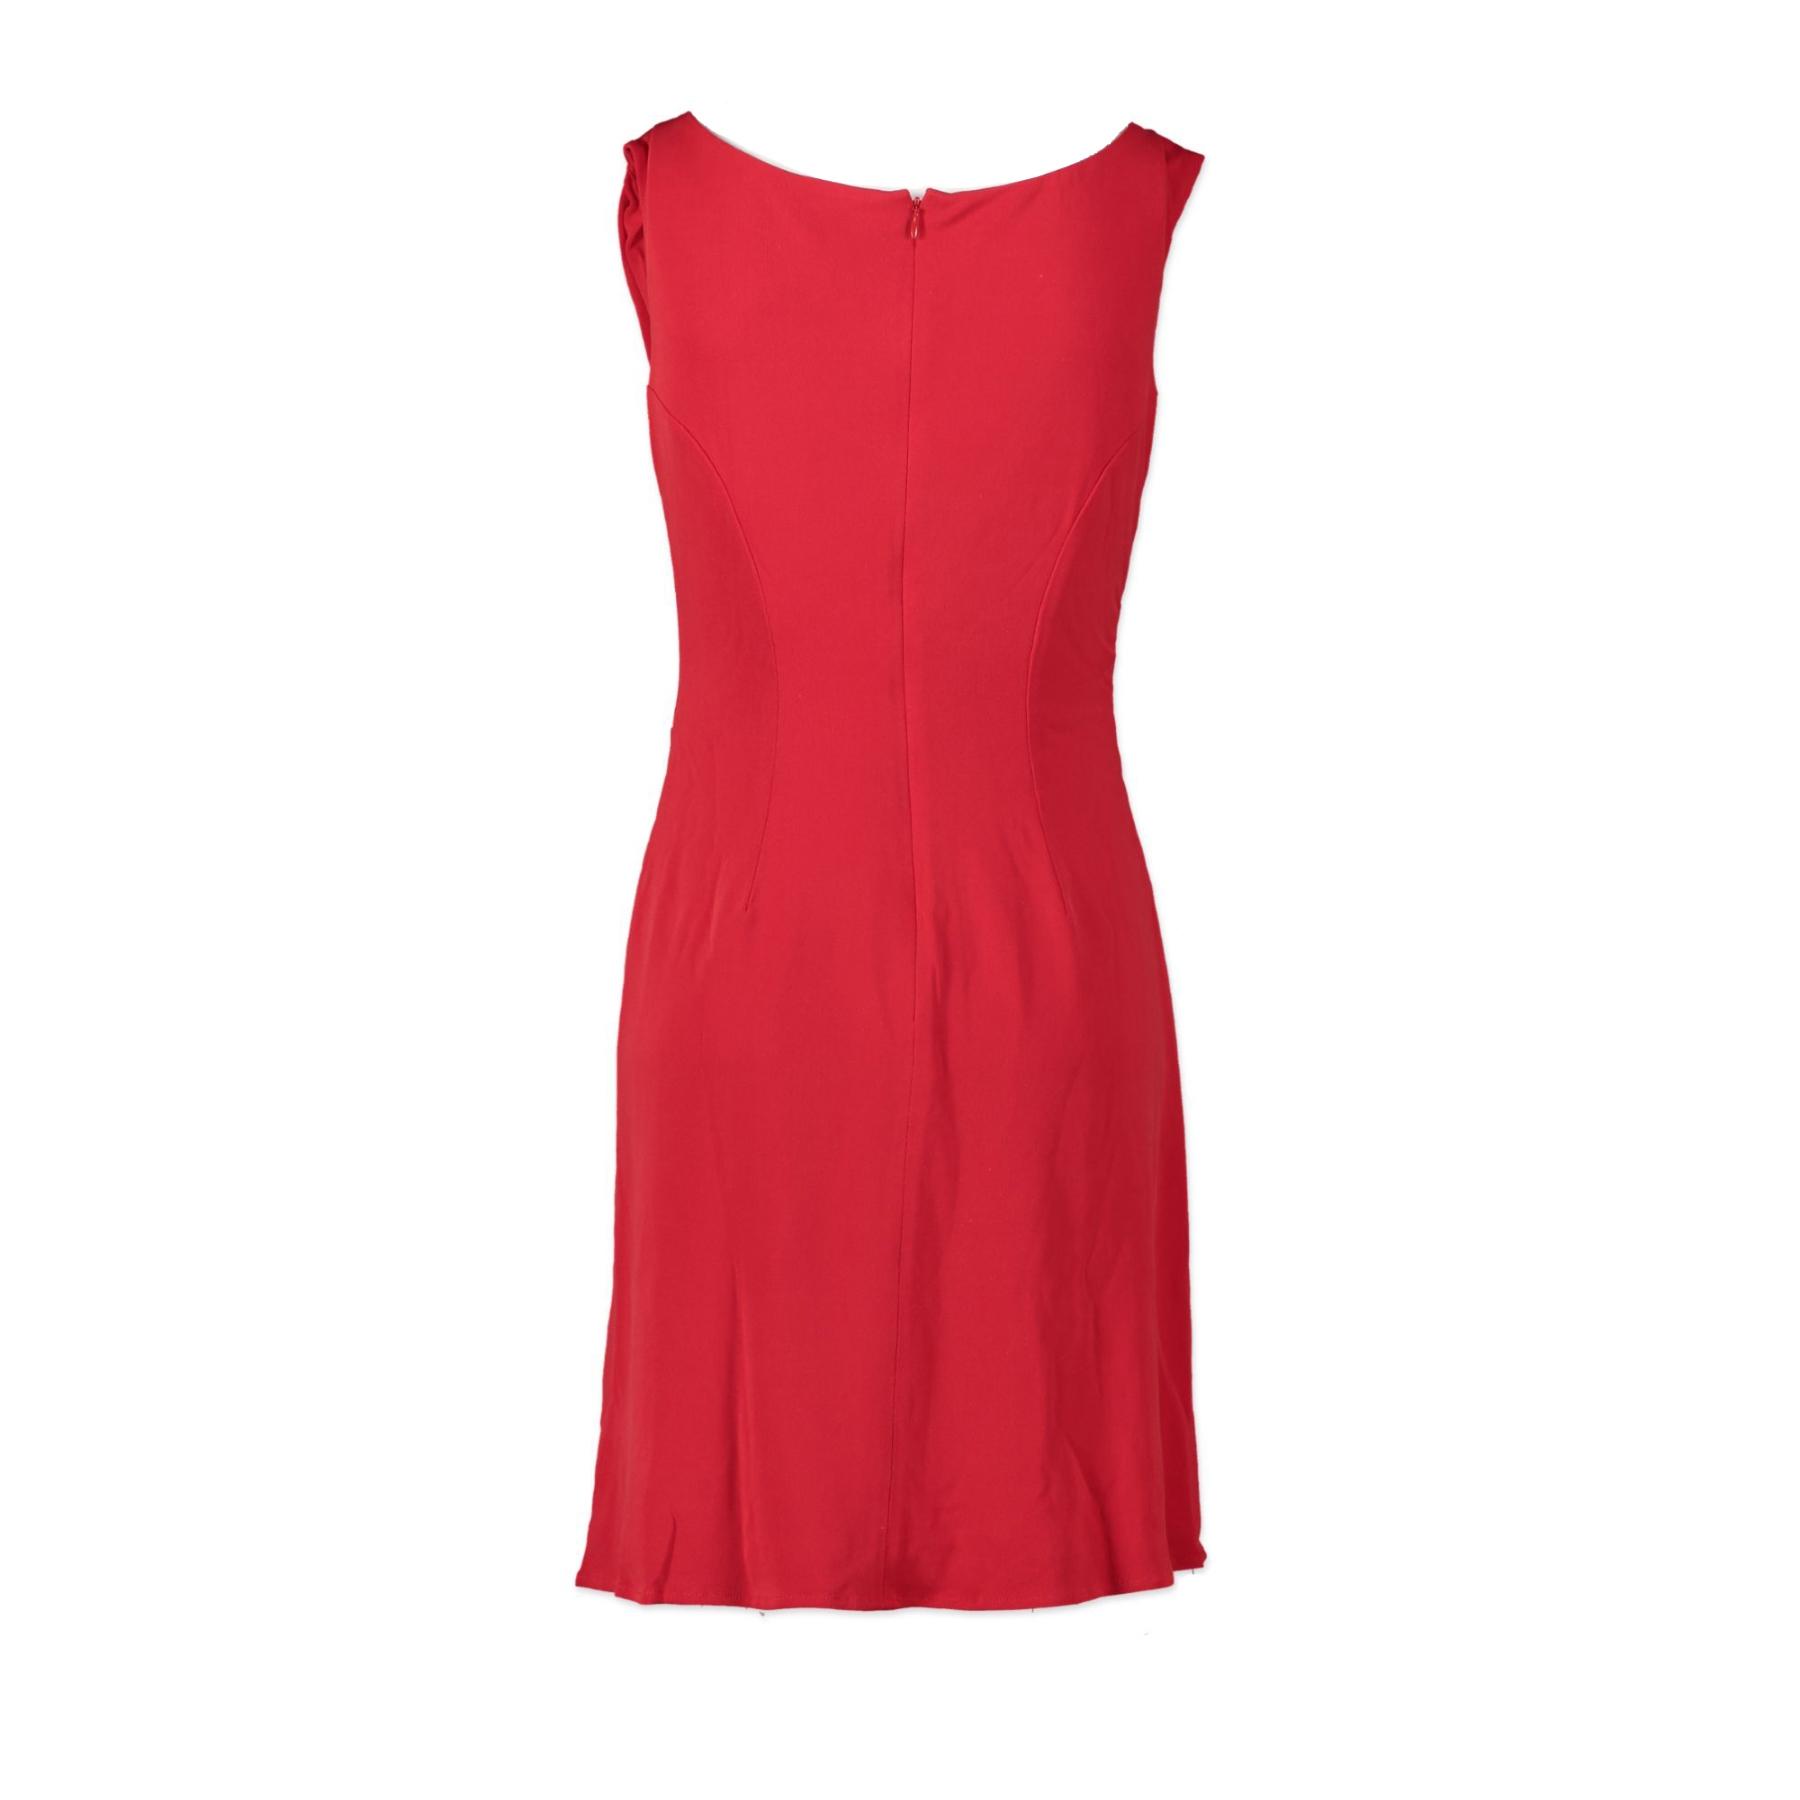 Issa London Red Silk Dress - UK8